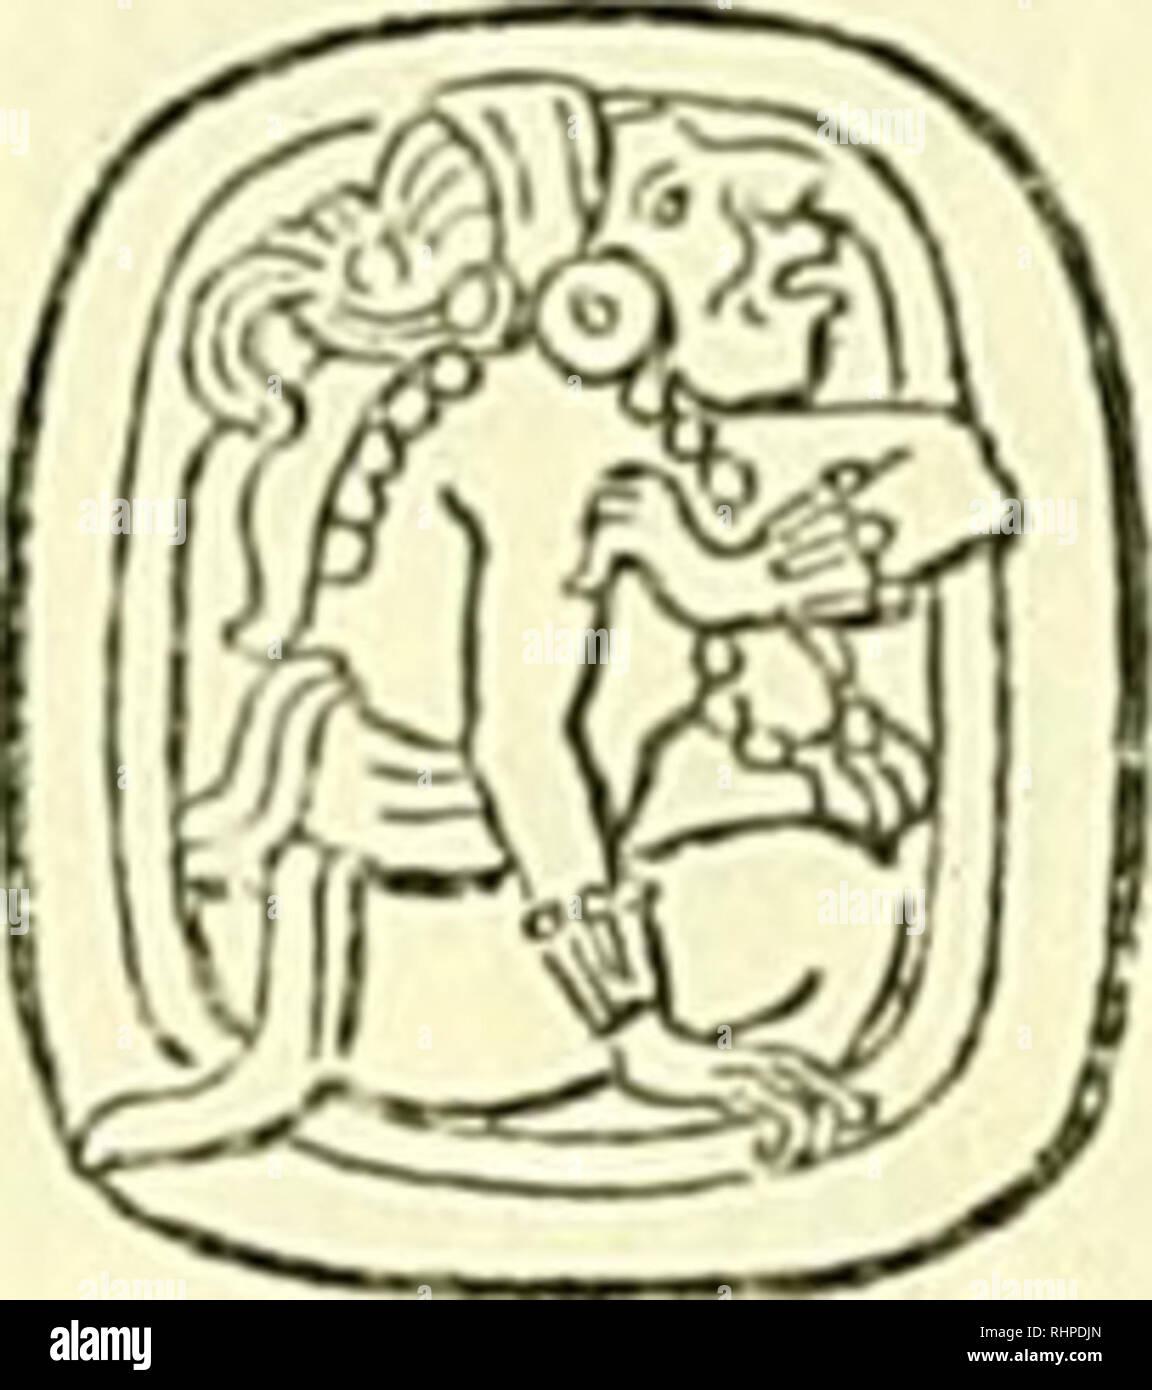 Calendrier Maya Signe.Biologia Centrali Americana Ou Les Contributions A La